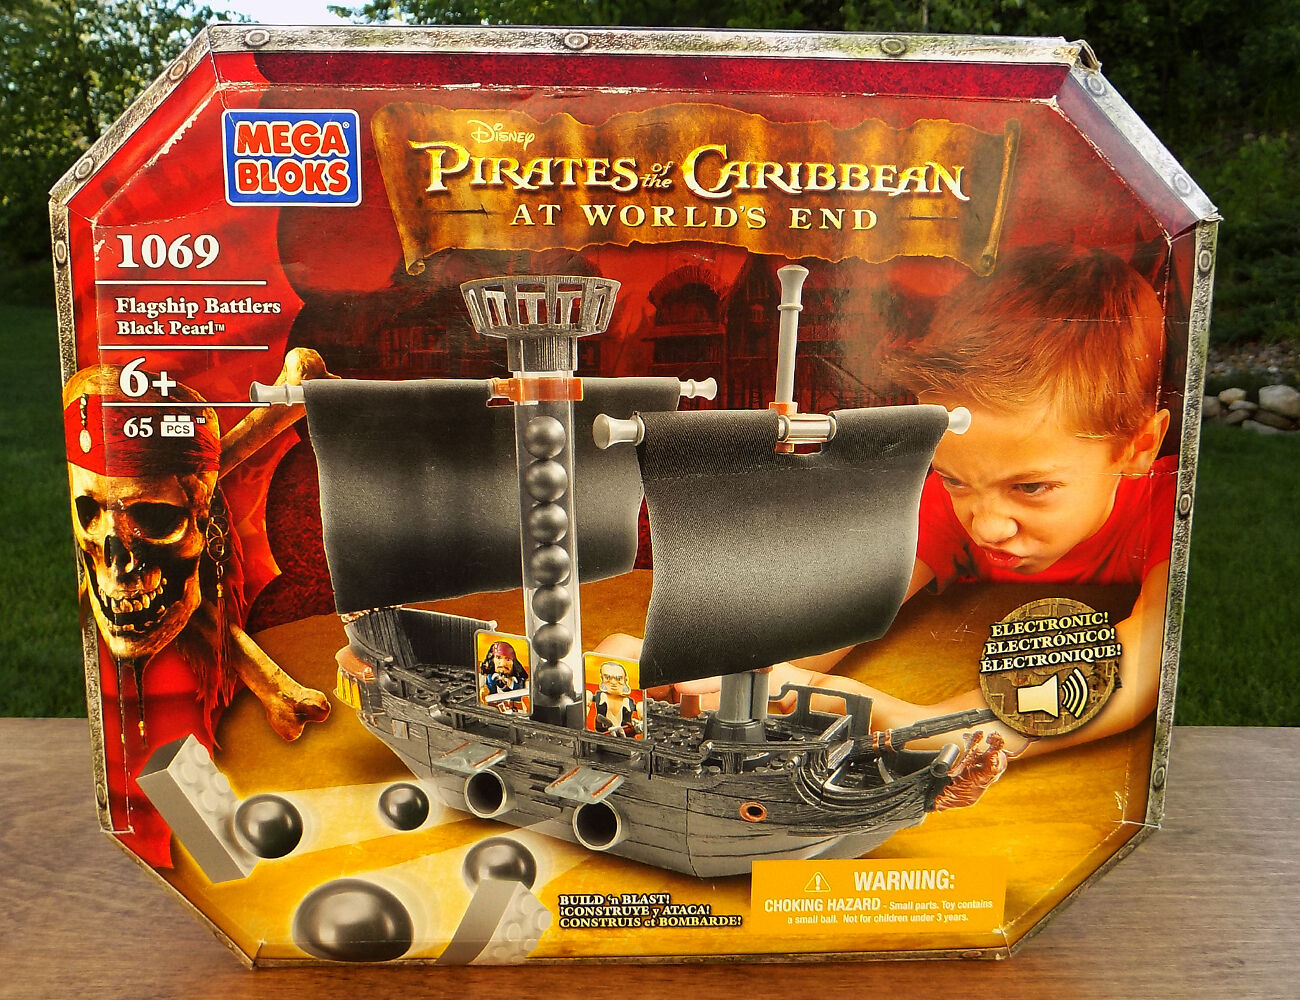 Part for Sales-Mega Bloks Pirates of the Caribbean Black Pearl